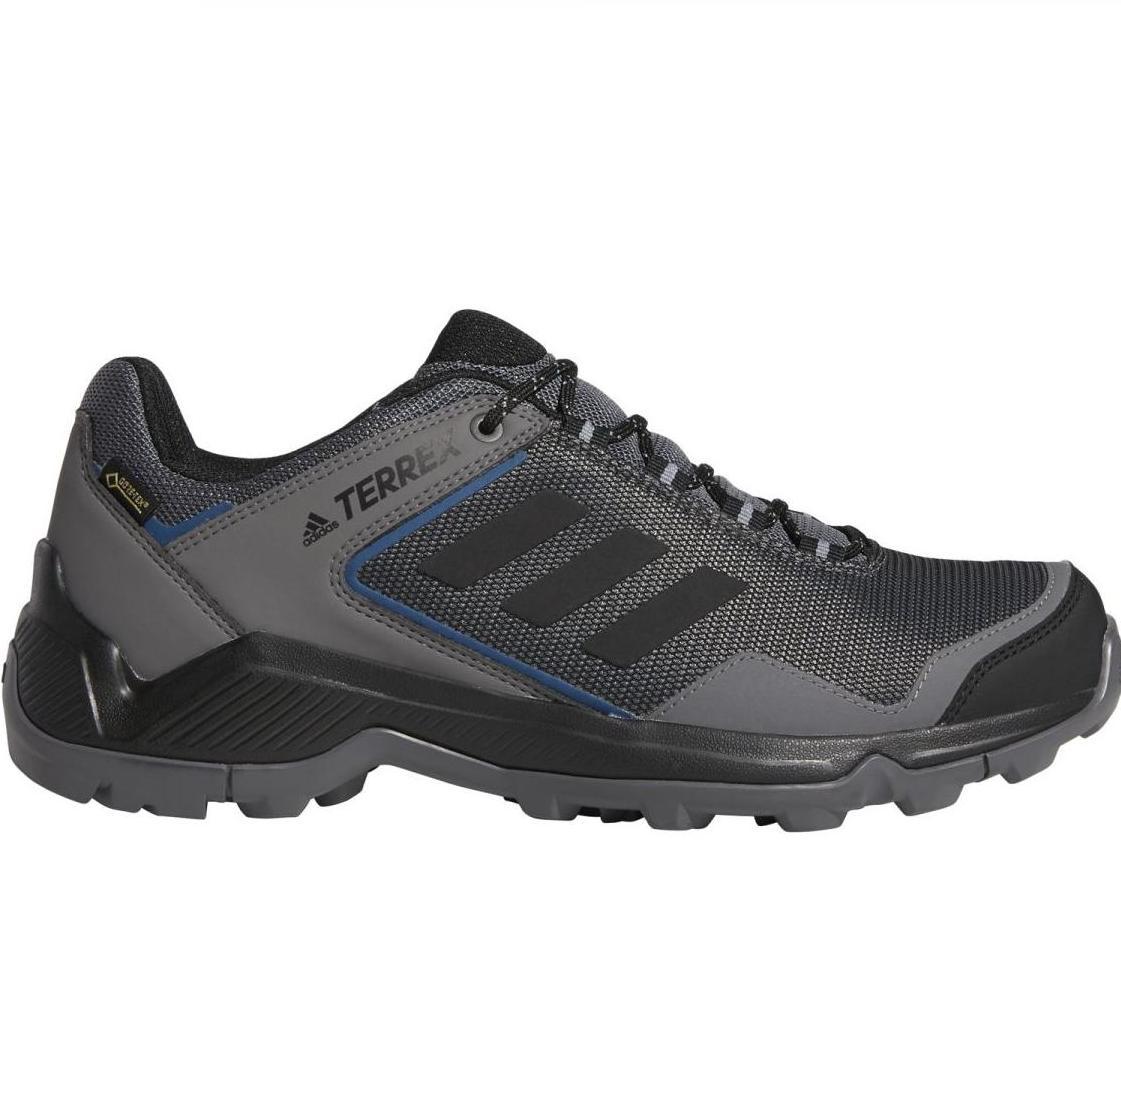 online retailer 39786 1cbd5 Adidas Herren Outdoor Schuhe TERREX EASTRAIL GTX grau